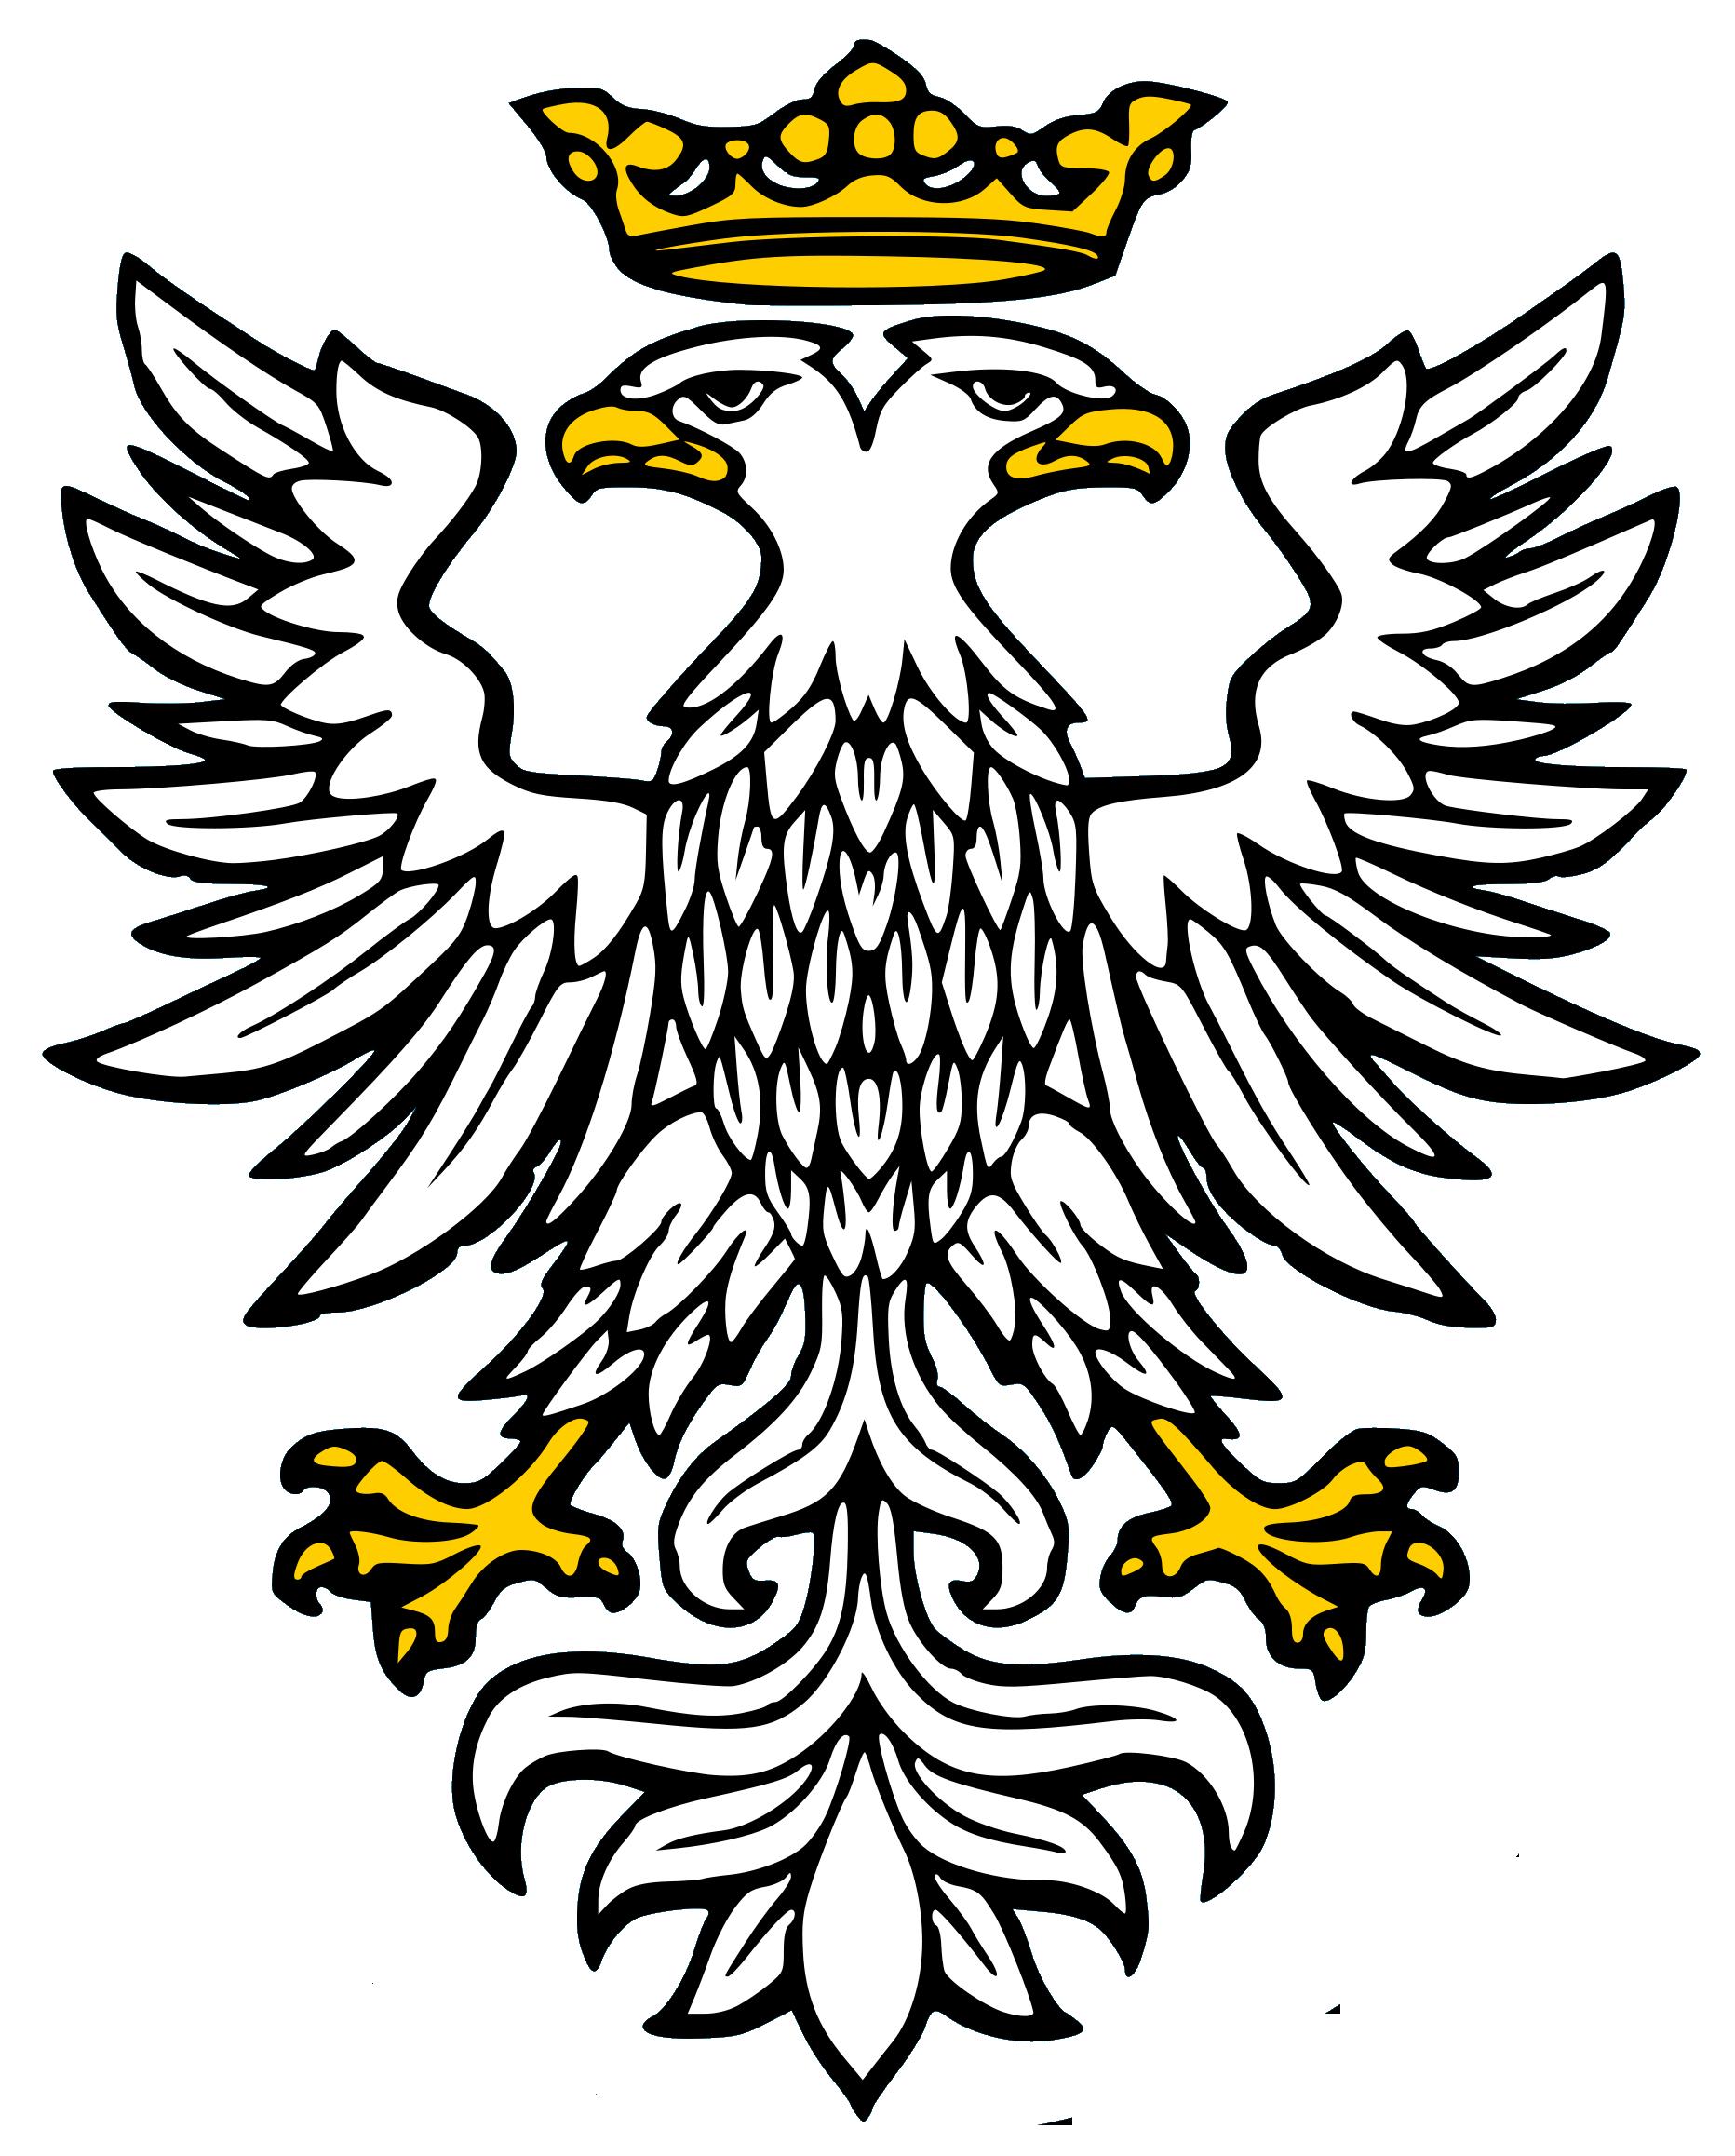 Mercia Crest